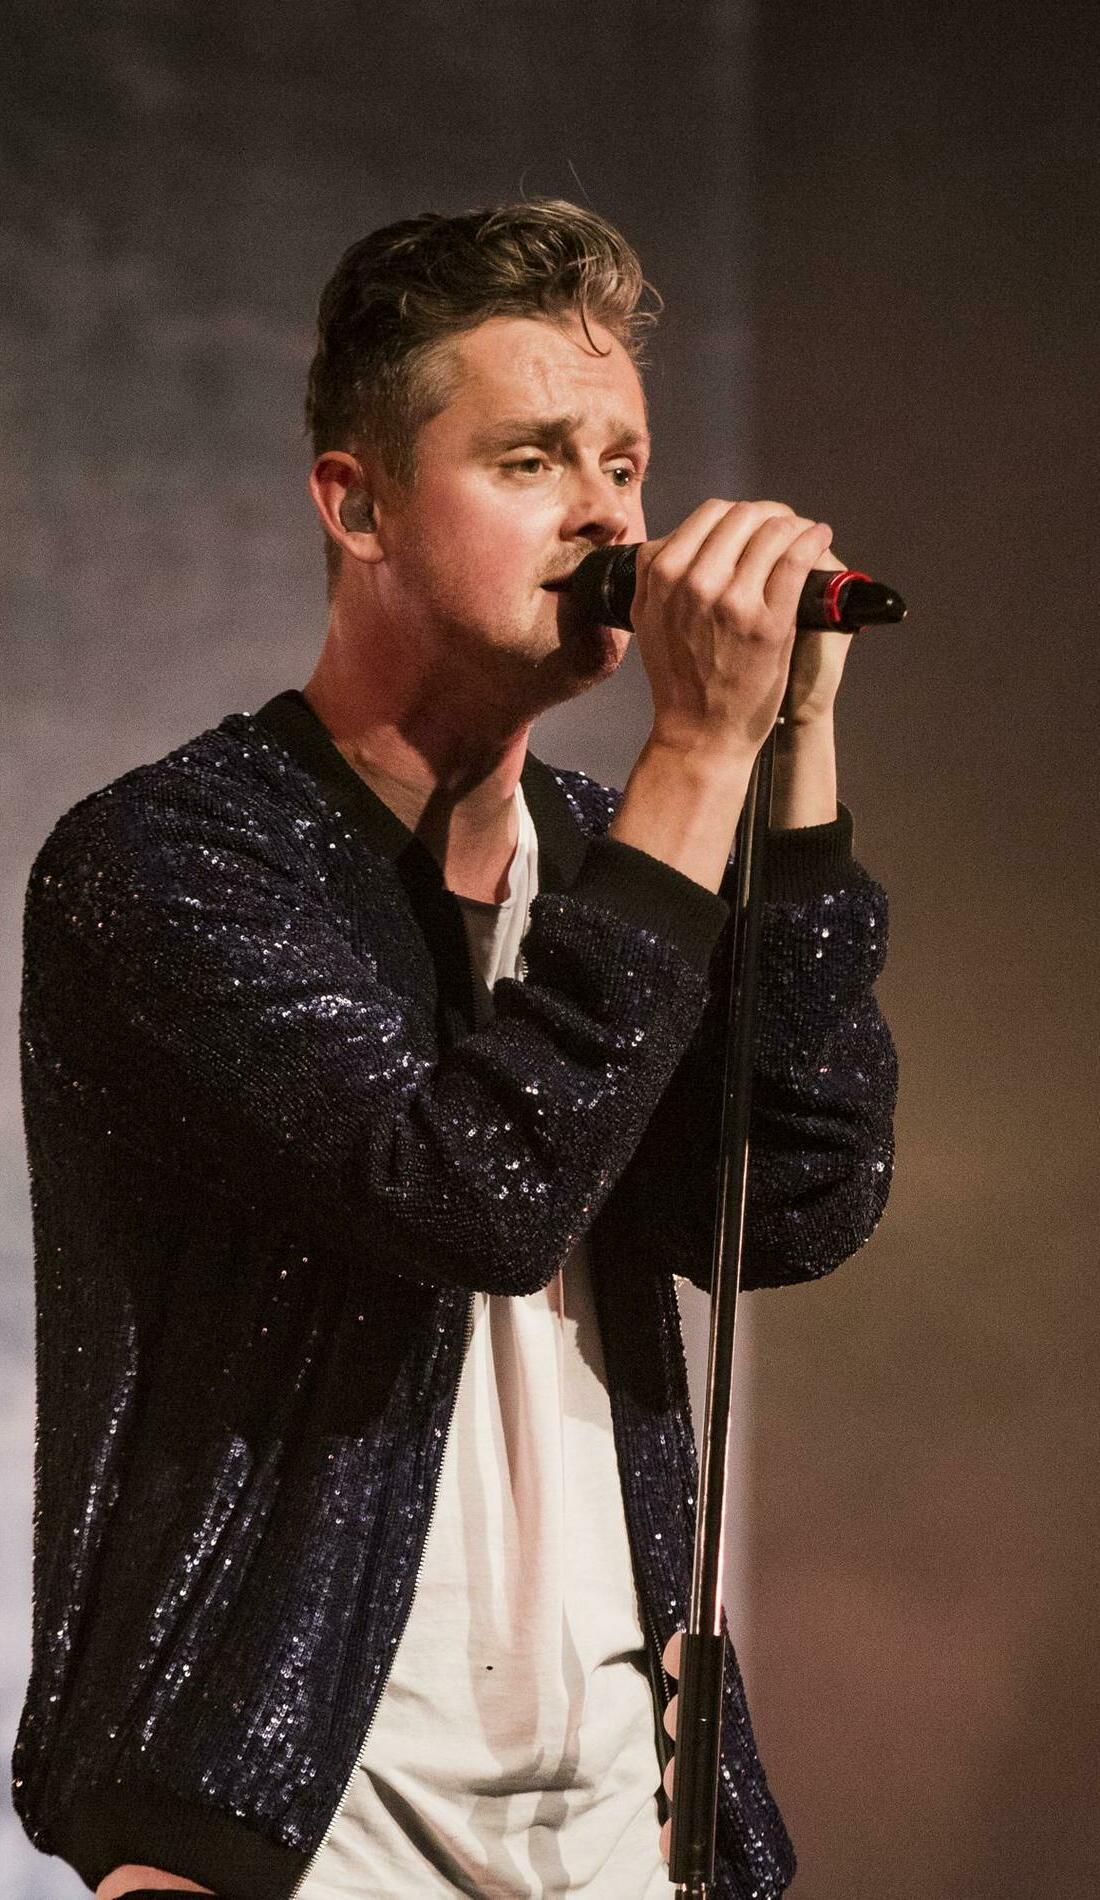 A Keane live event